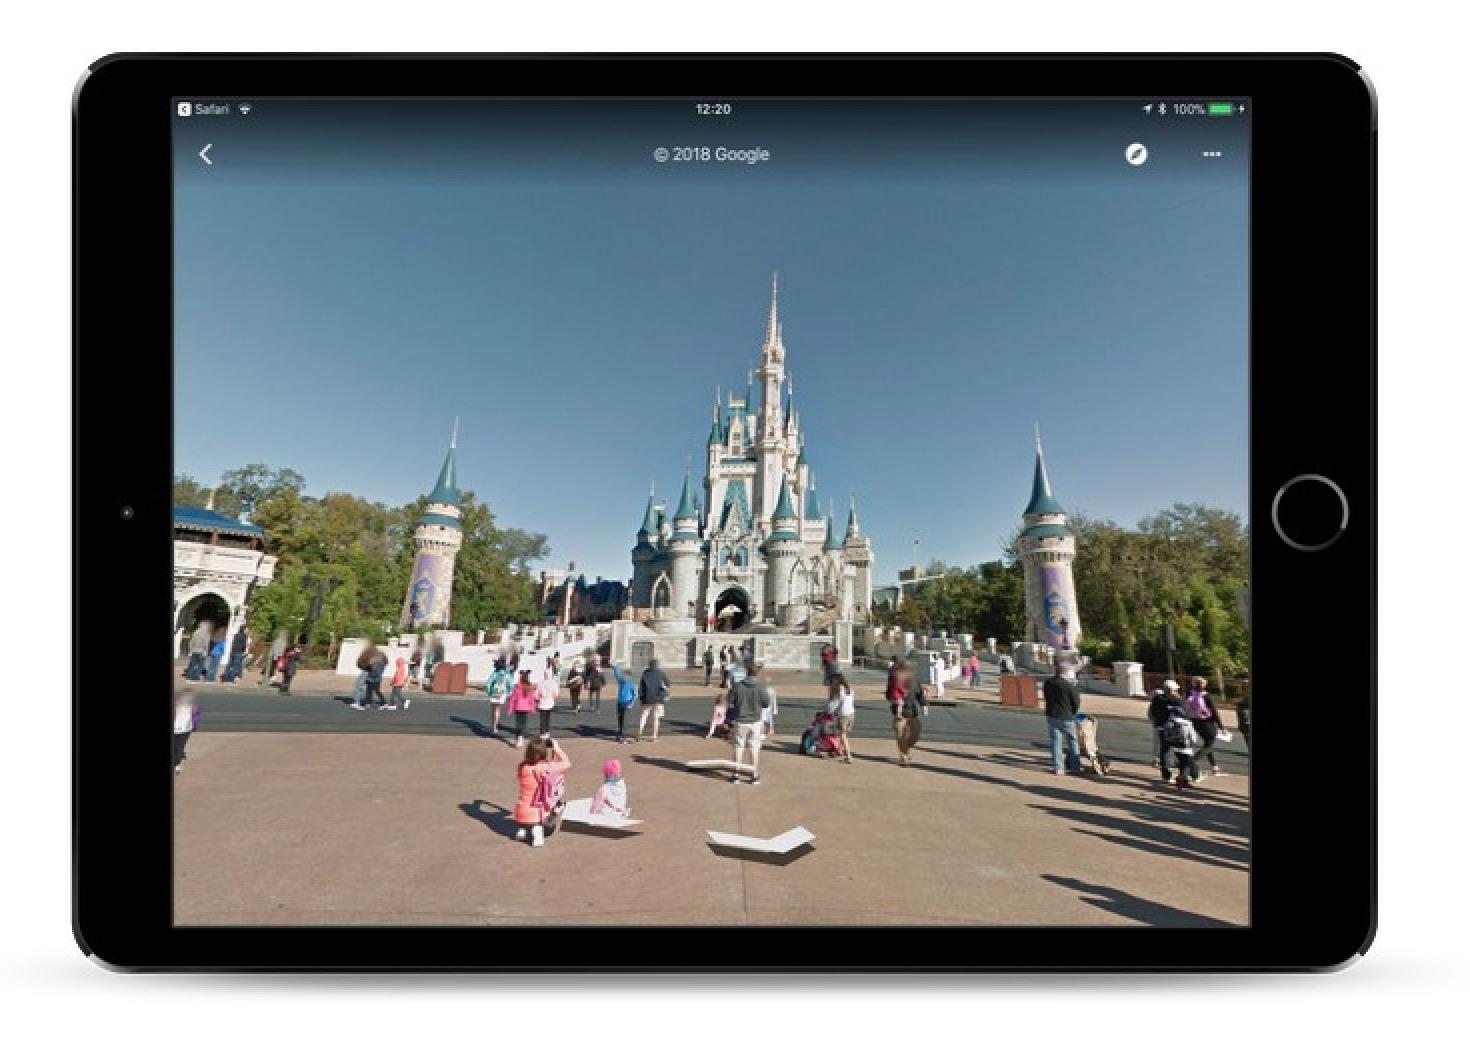 Google Maps Adds 11 Disney Parks to Street View - MacRumors